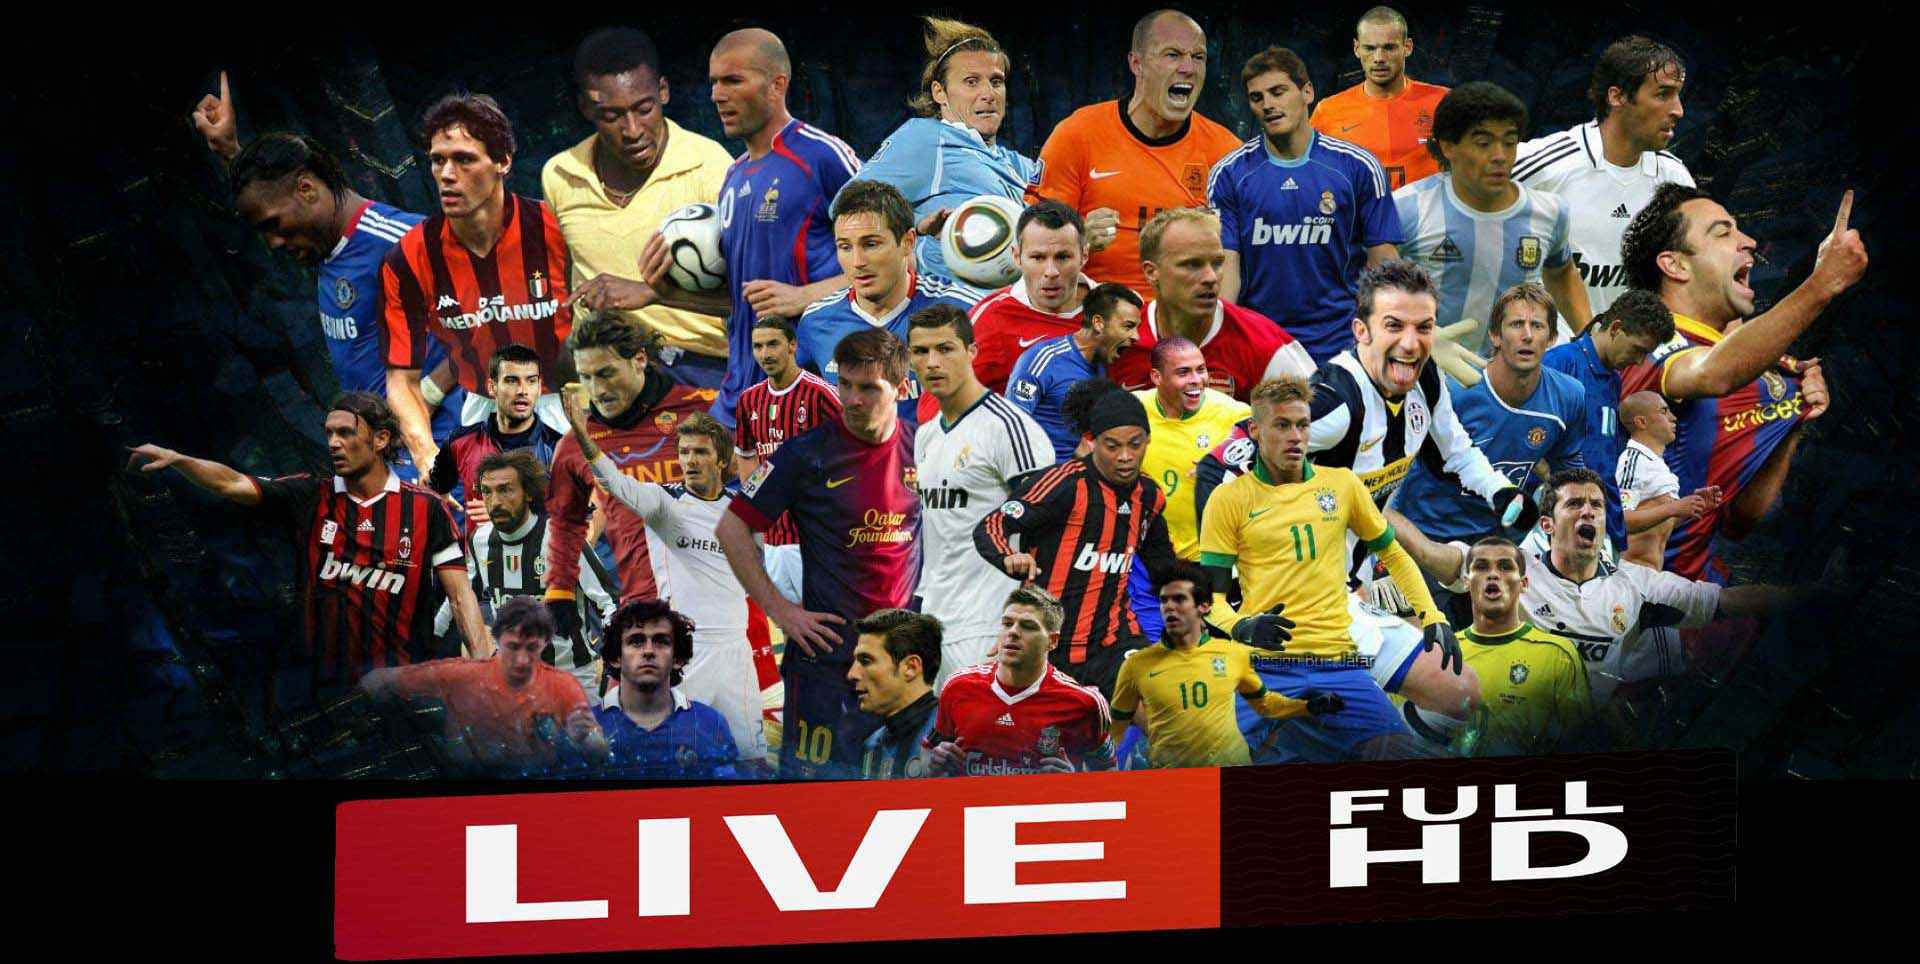 Ludogorets vs Paris Streaming Live